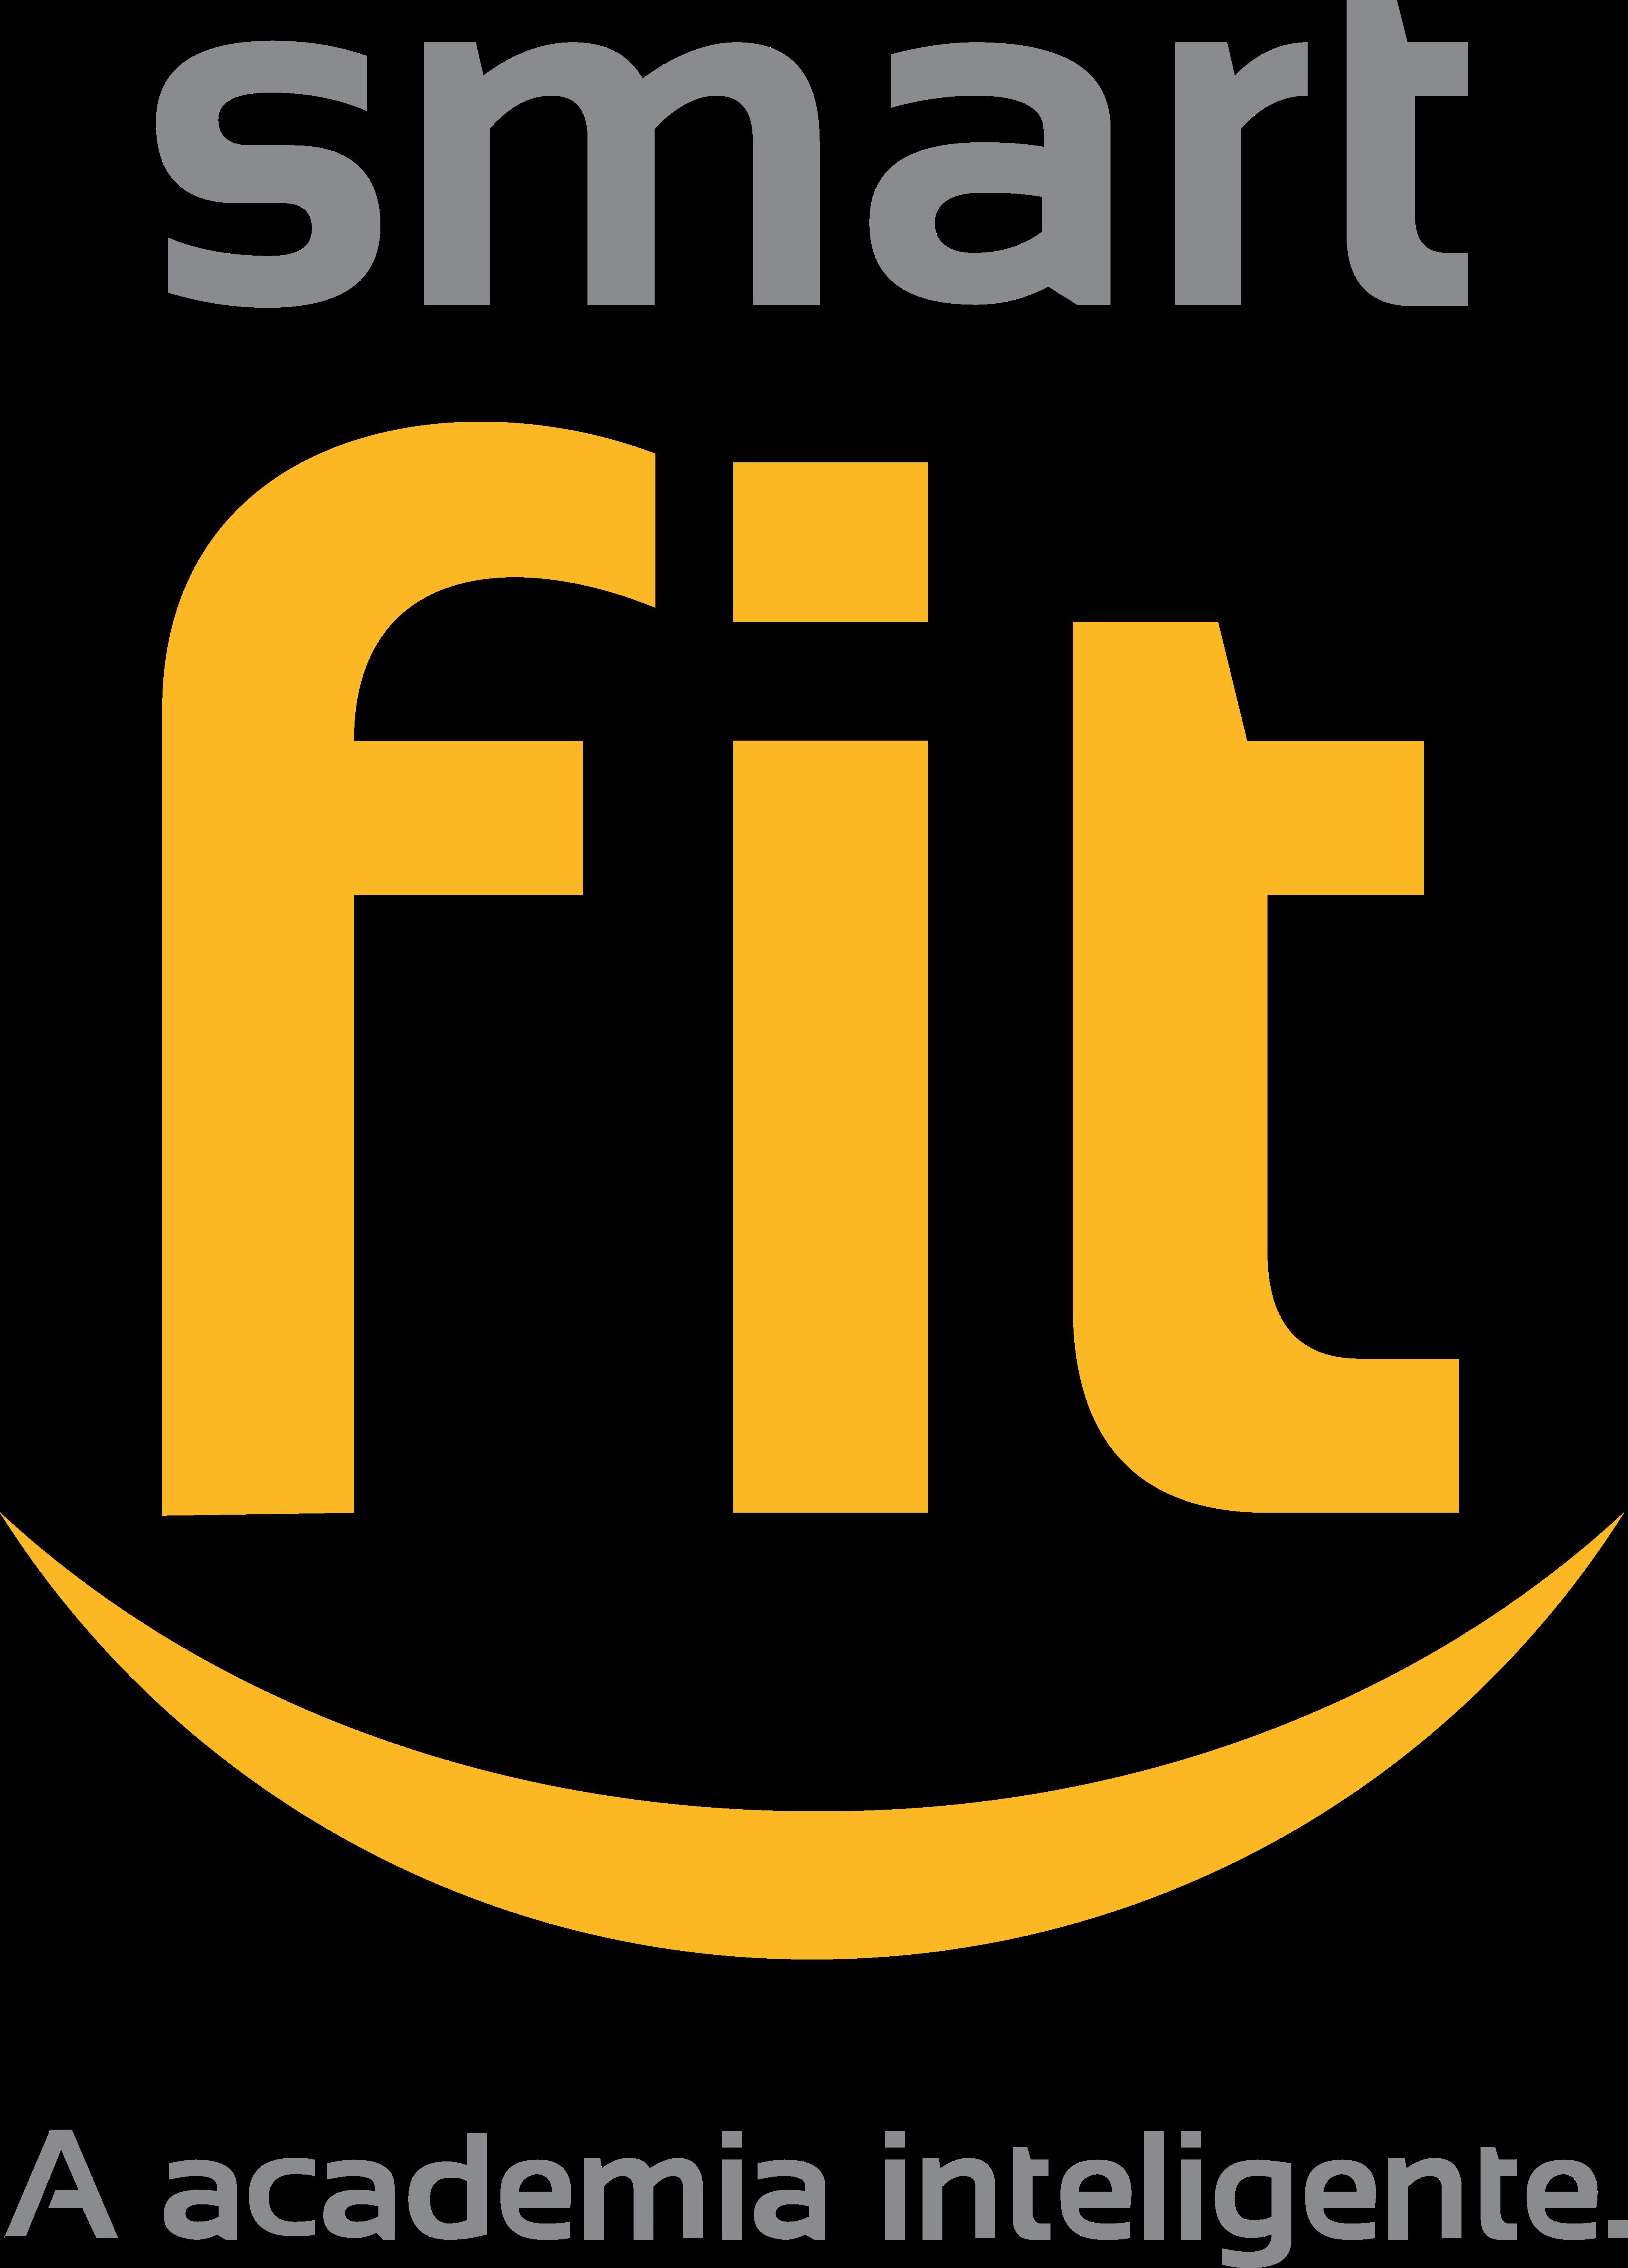 smart fit logo 1 - Smart Fit Logo